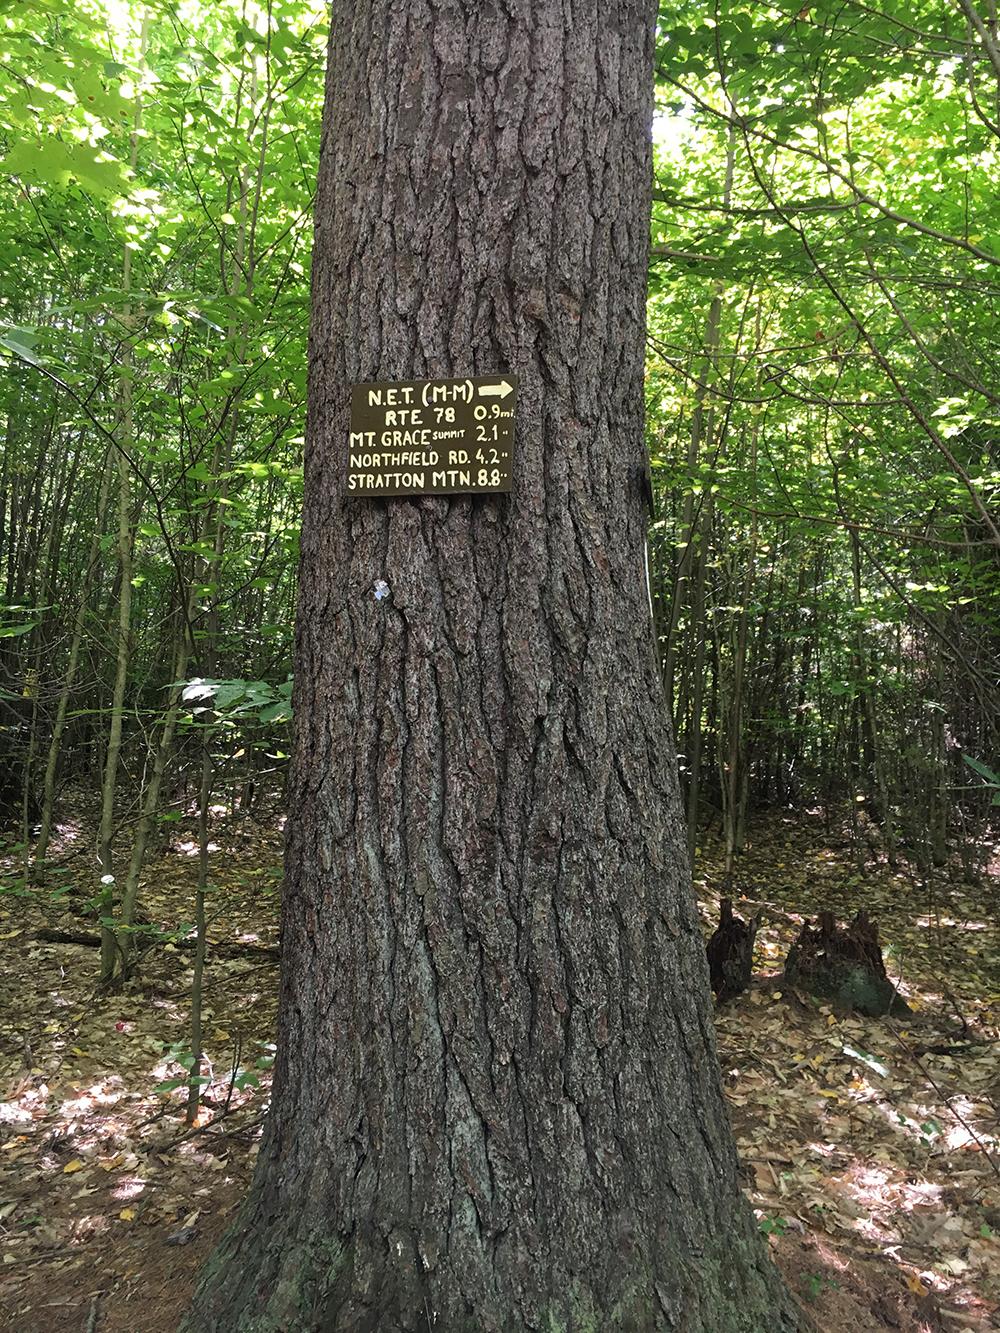 St-Grace-StateForest-signage